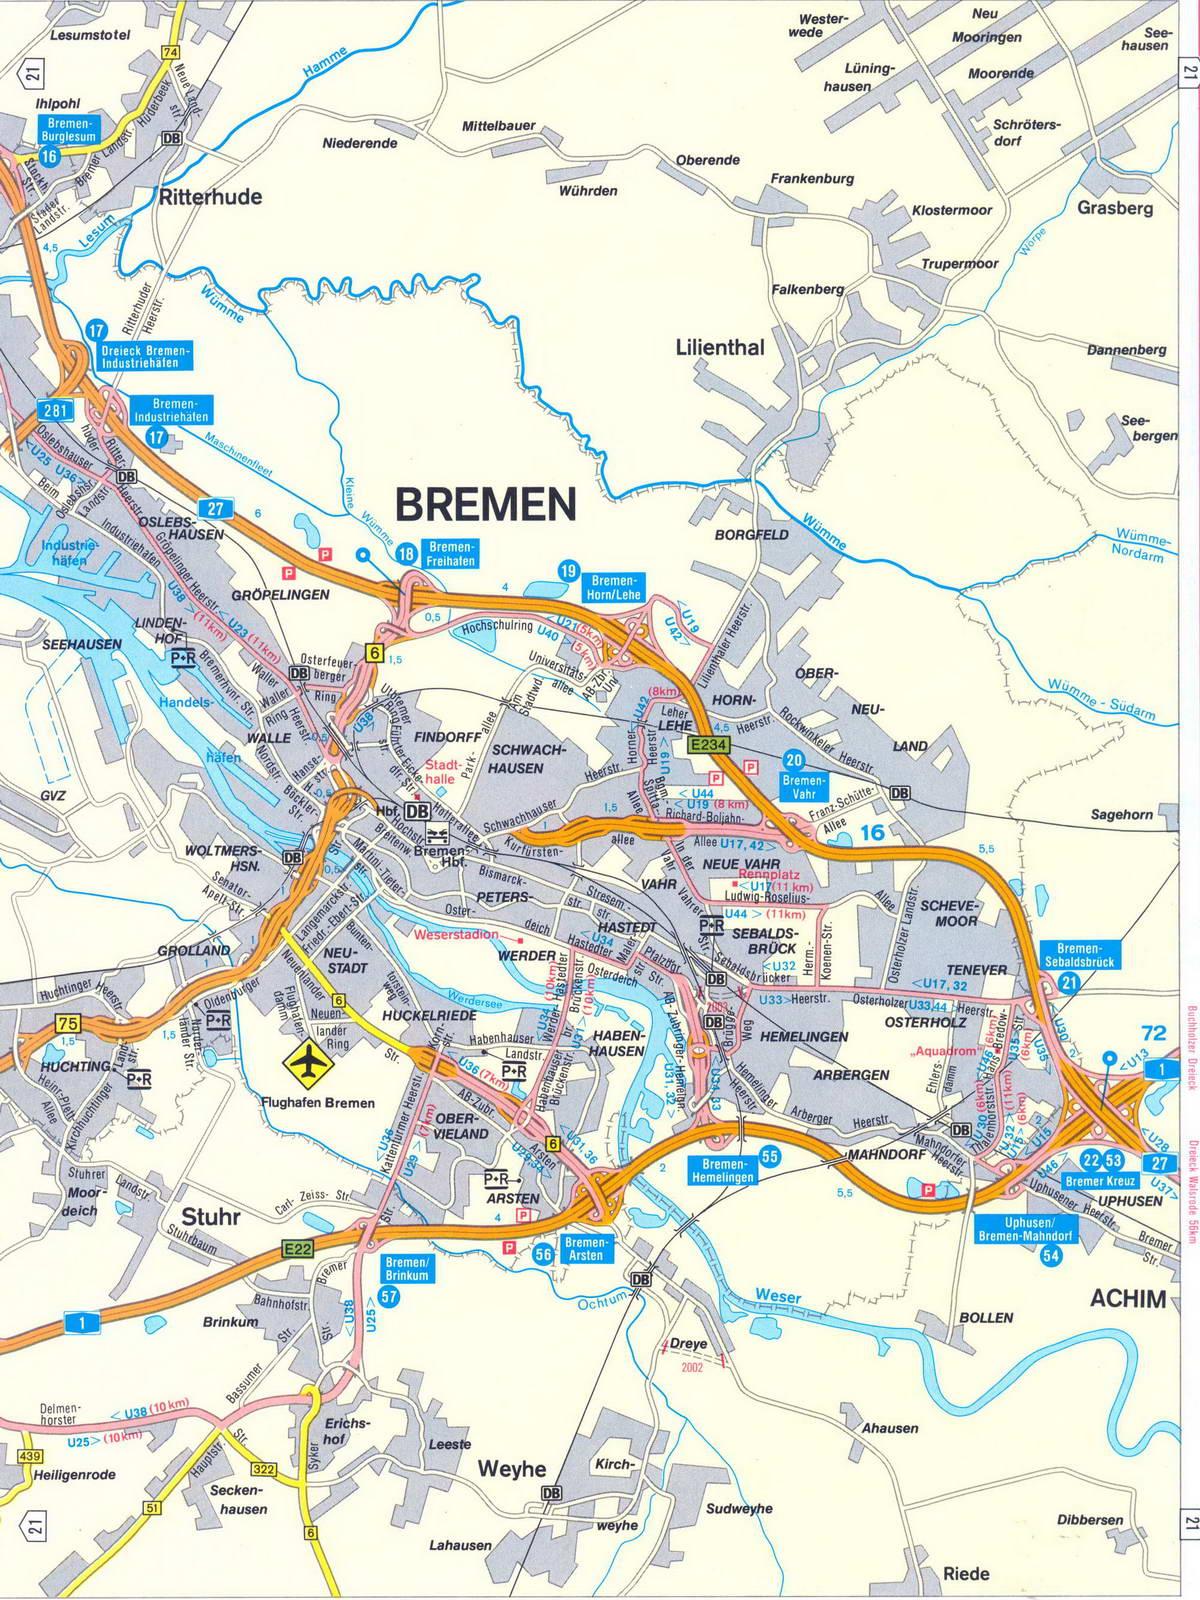 http://www.zonu.com/images/0X0/2011-06-08-13892/Mapa-de-Bremen.jpg